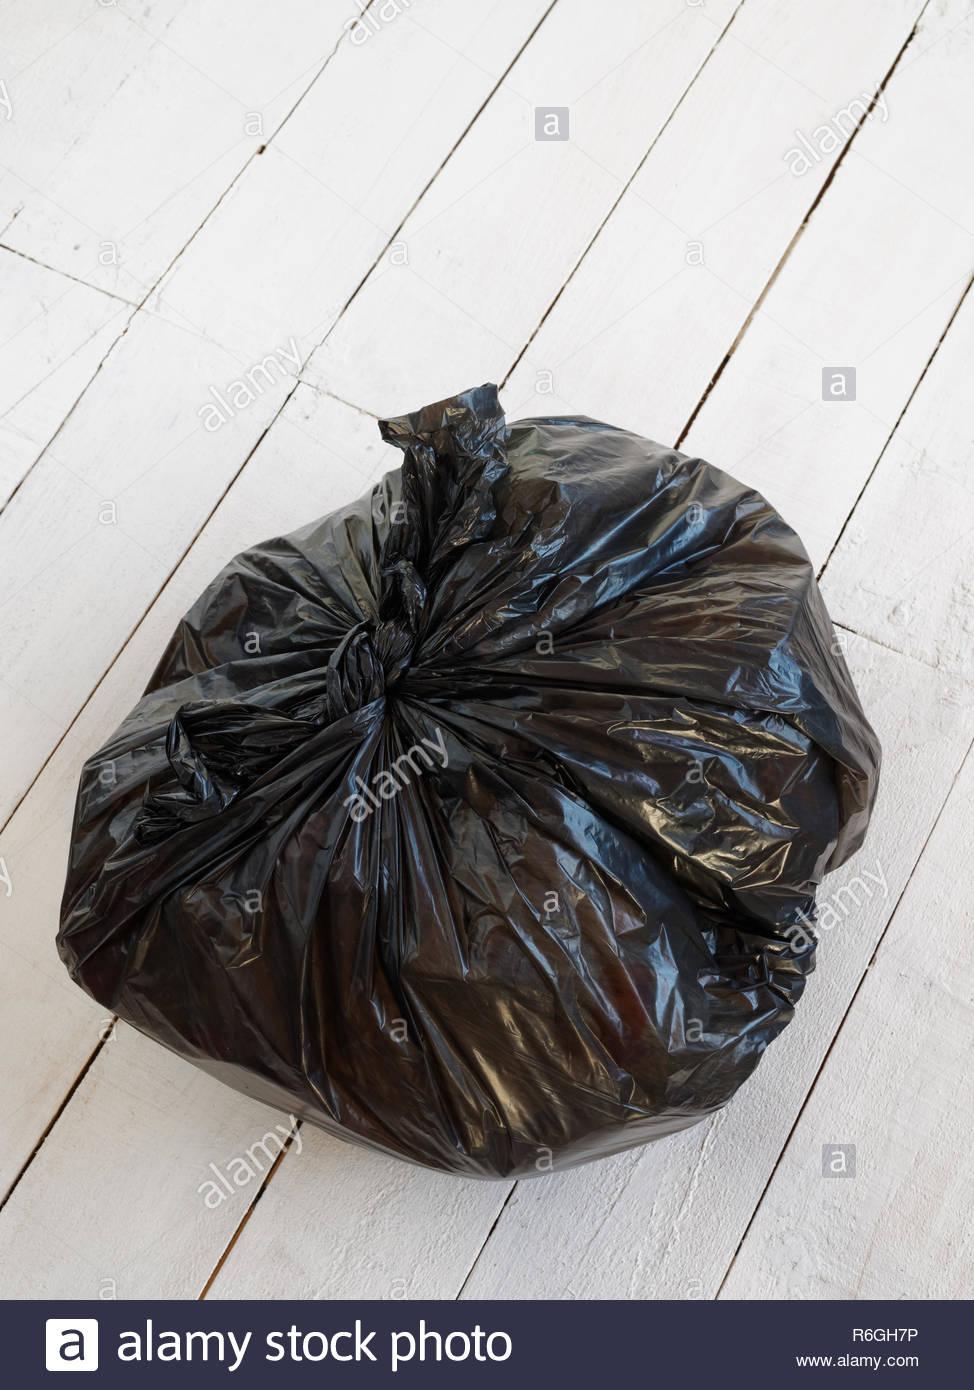 Bolsa de plástico negra llena de basura, aislado sobre fondo